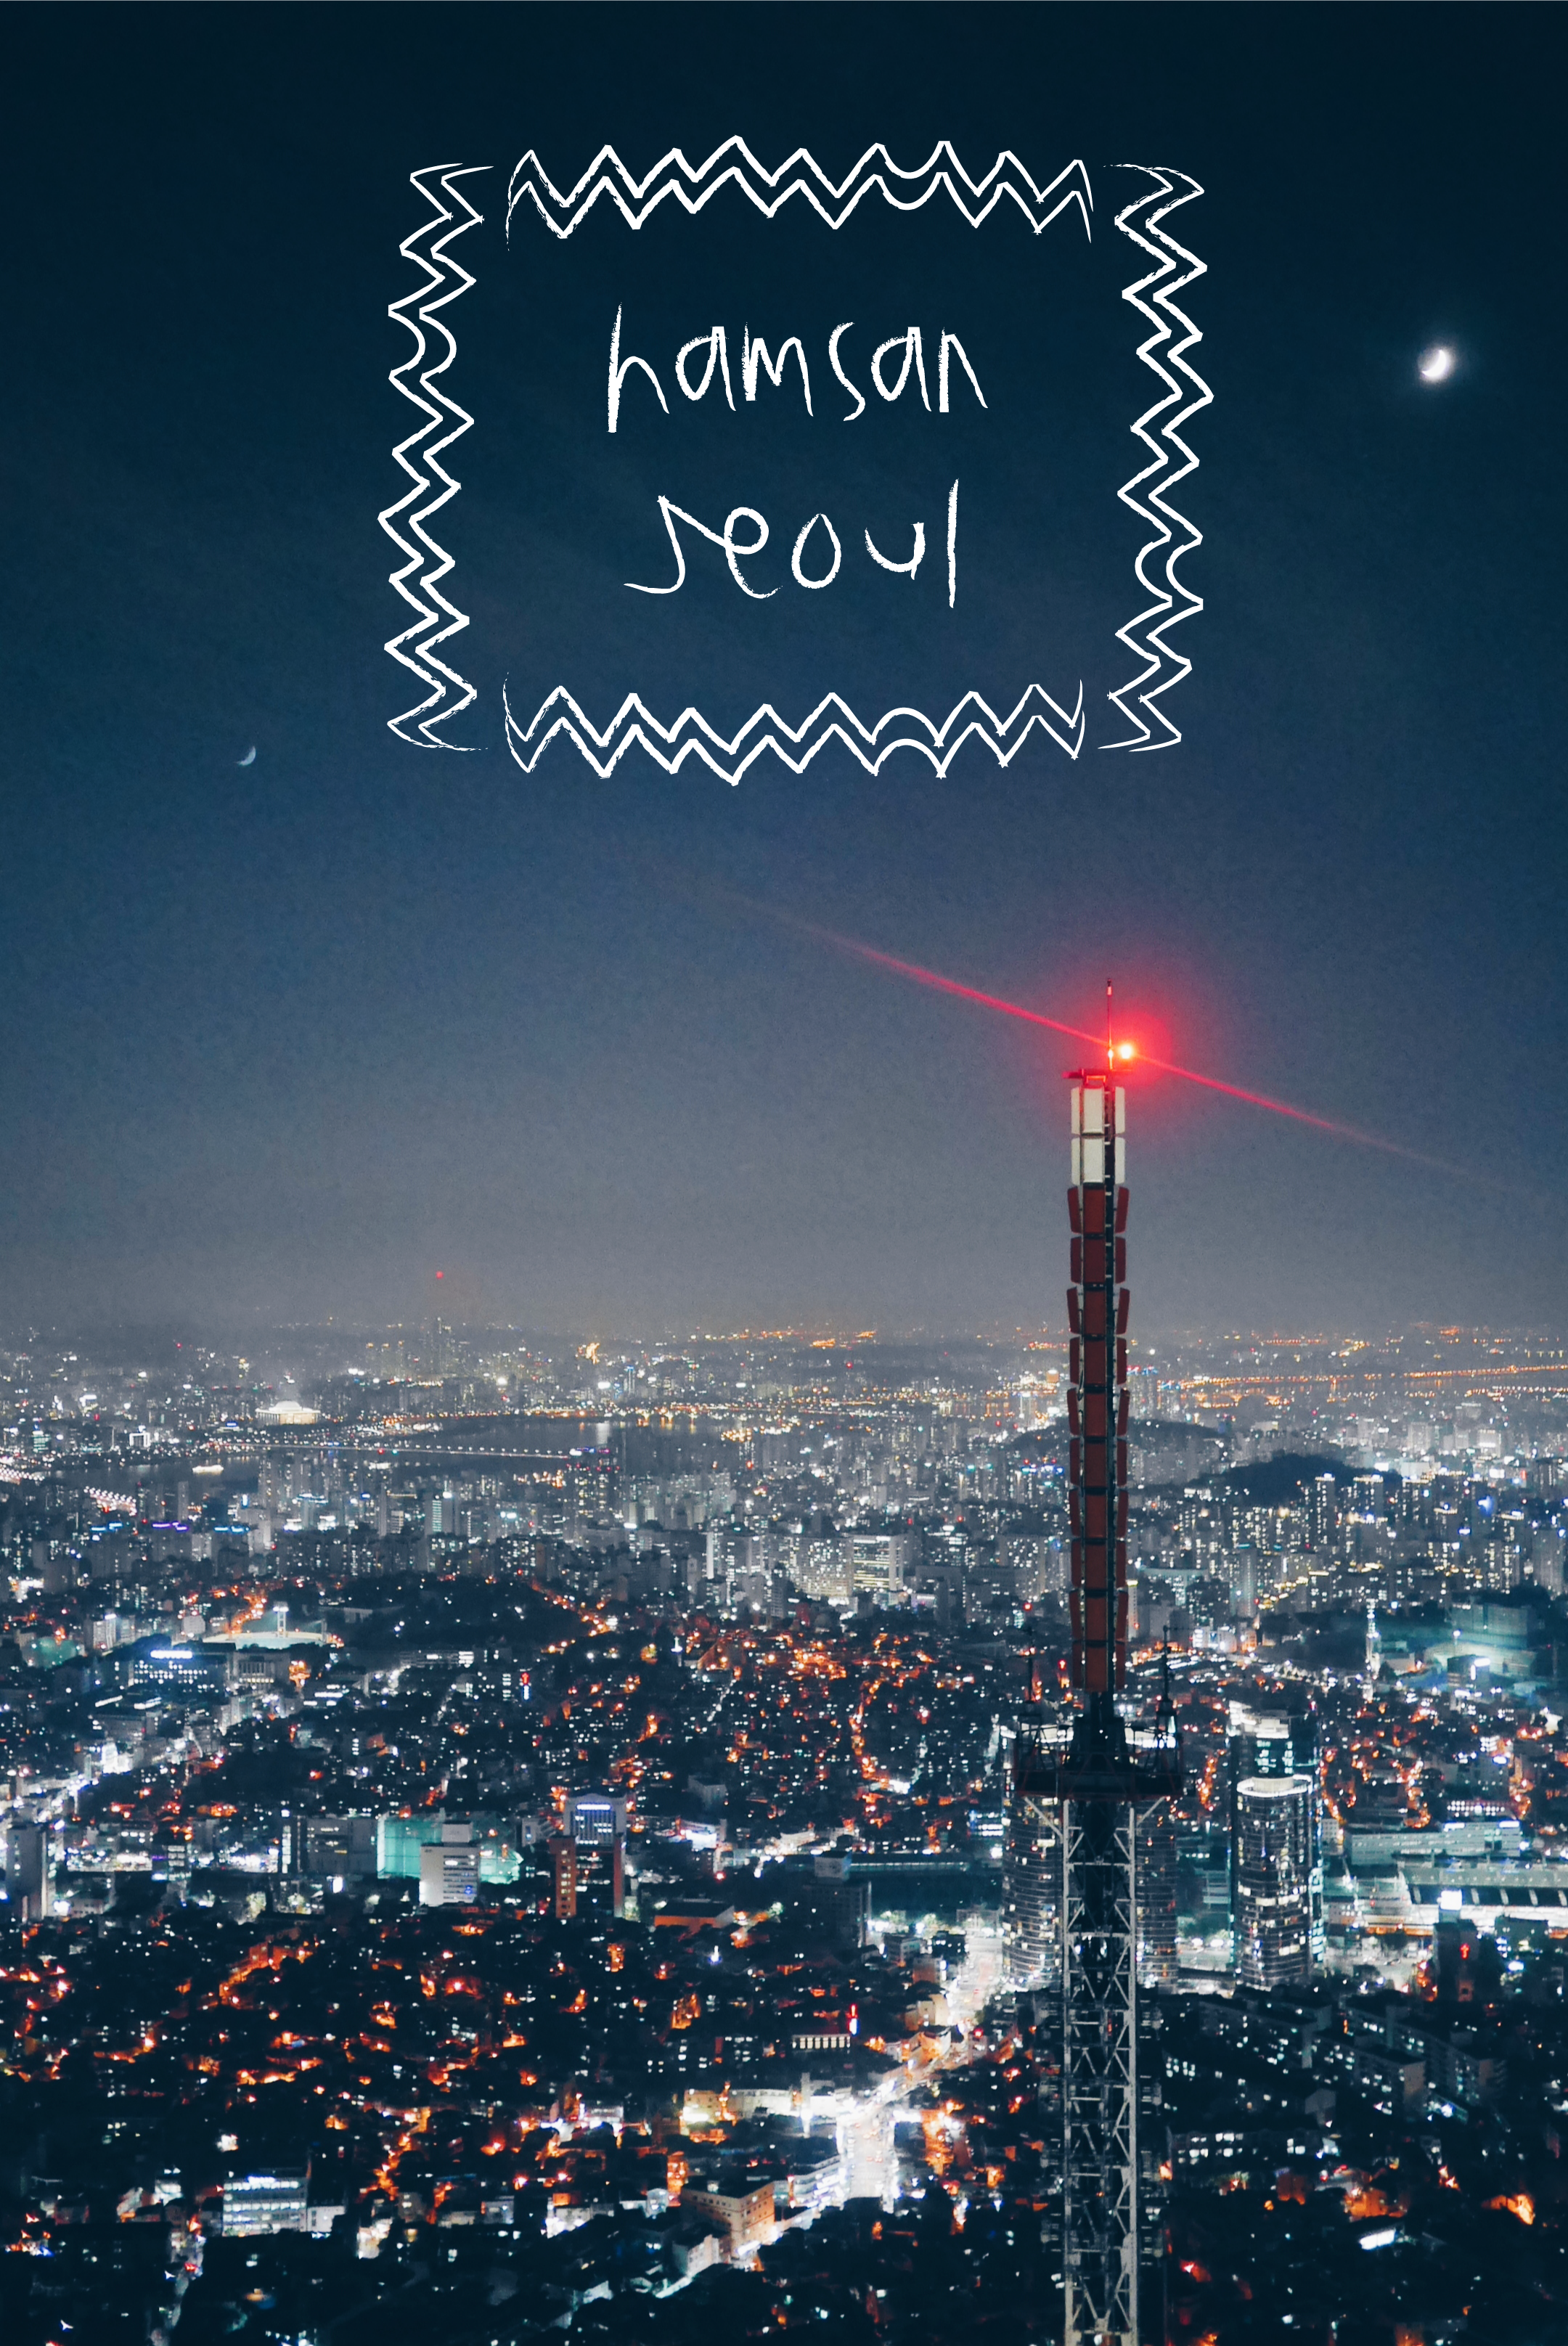 Photo Essay Namsan Korea Travel South About